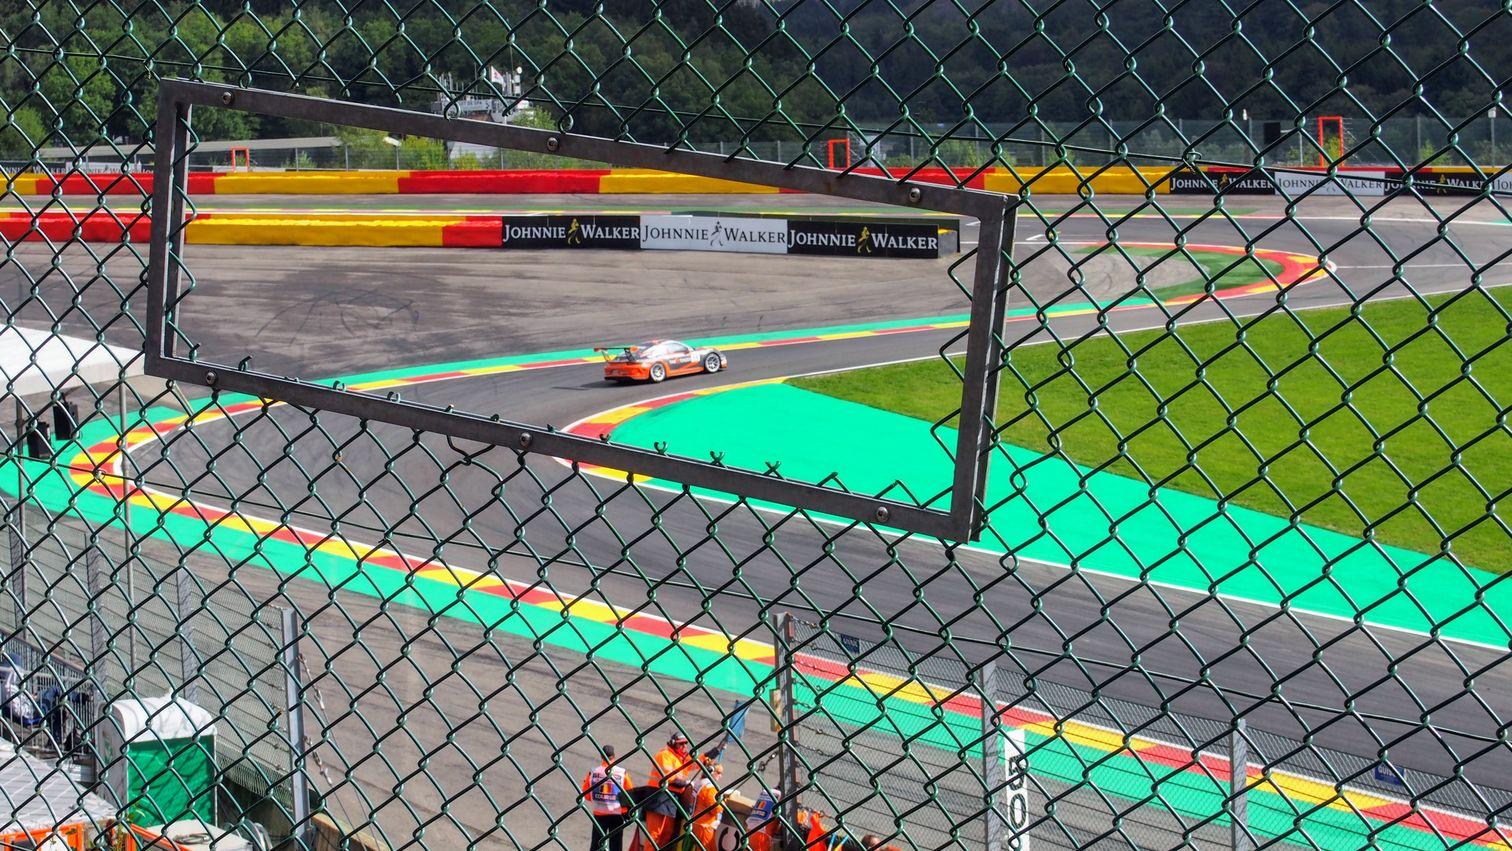 Porsche Supercup race at the Bus Stop chicane